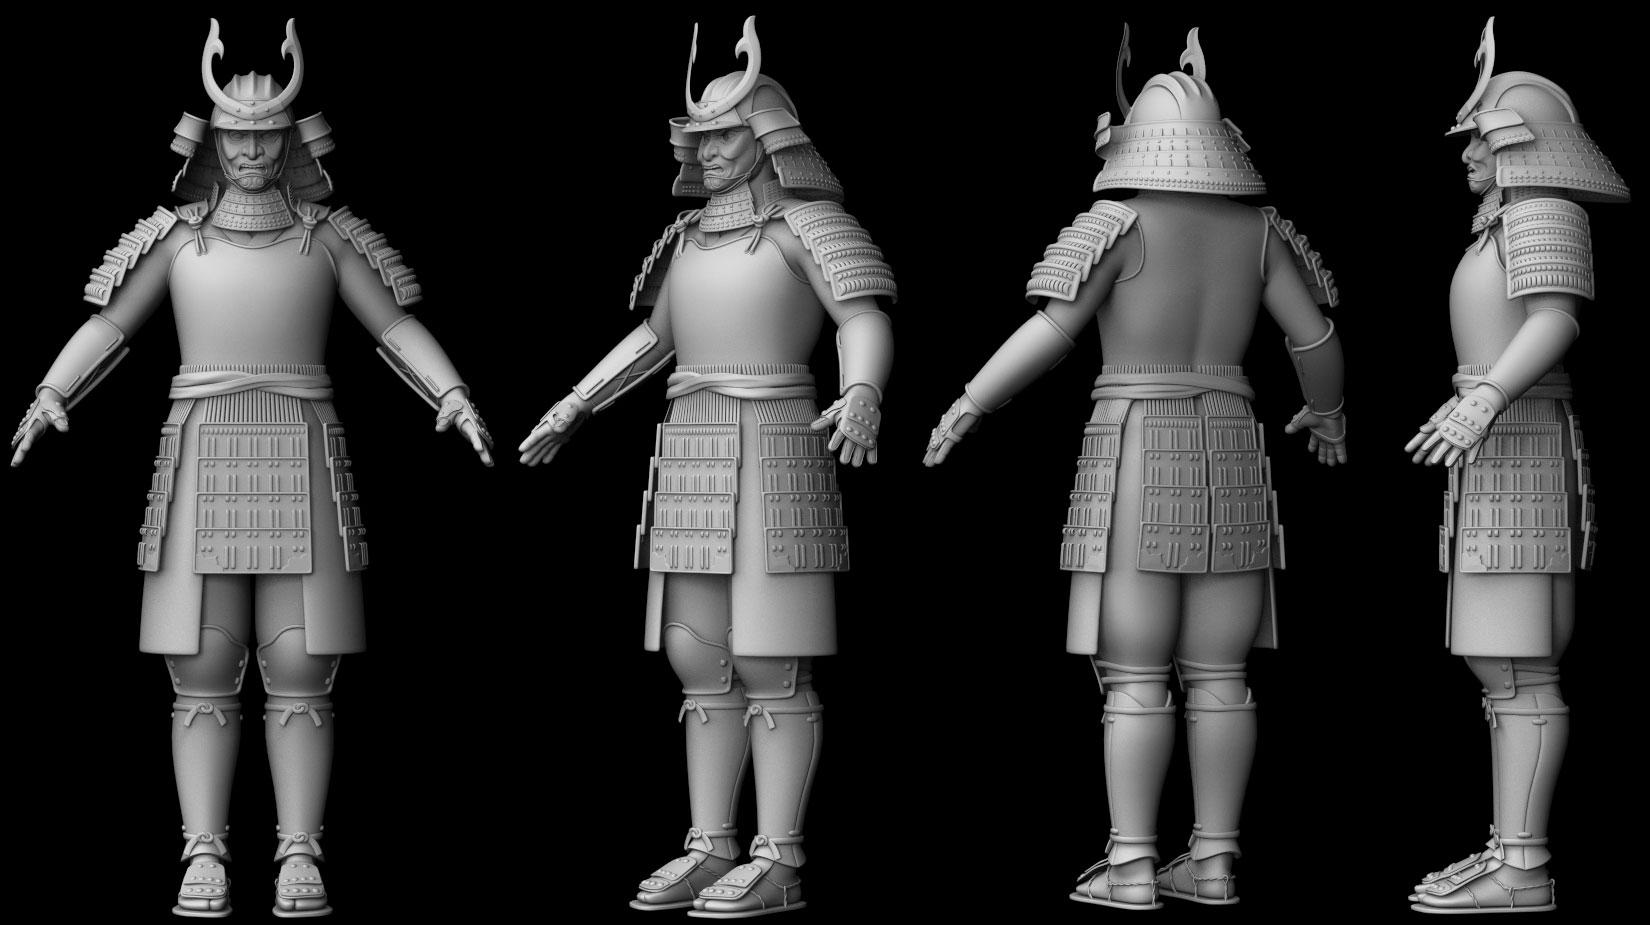 samurai wip by silesky on deviantart